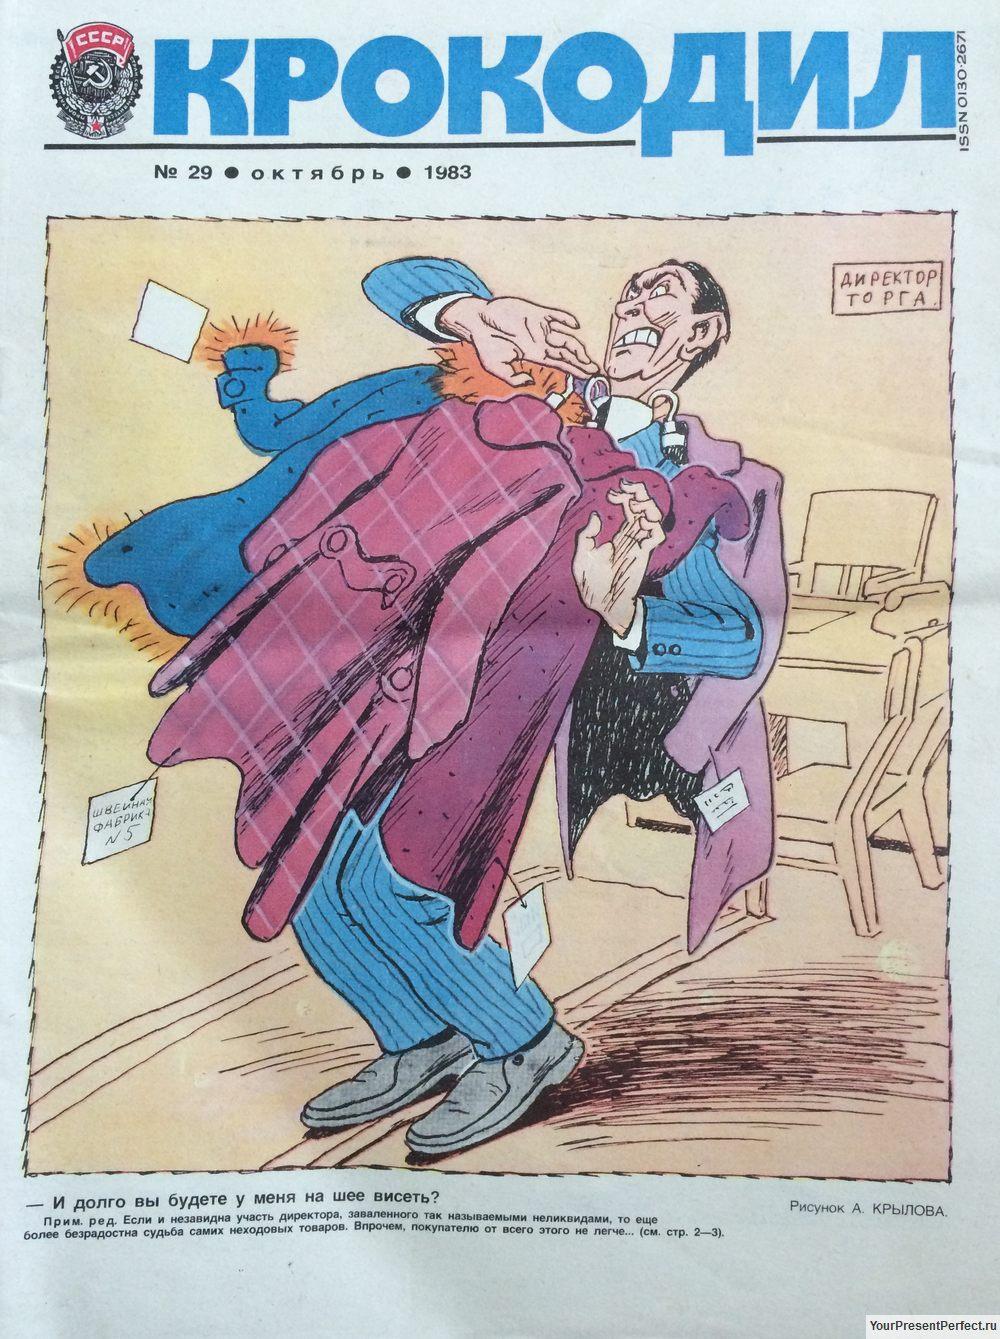 Журнал Крокодил №29 октябрь 1983